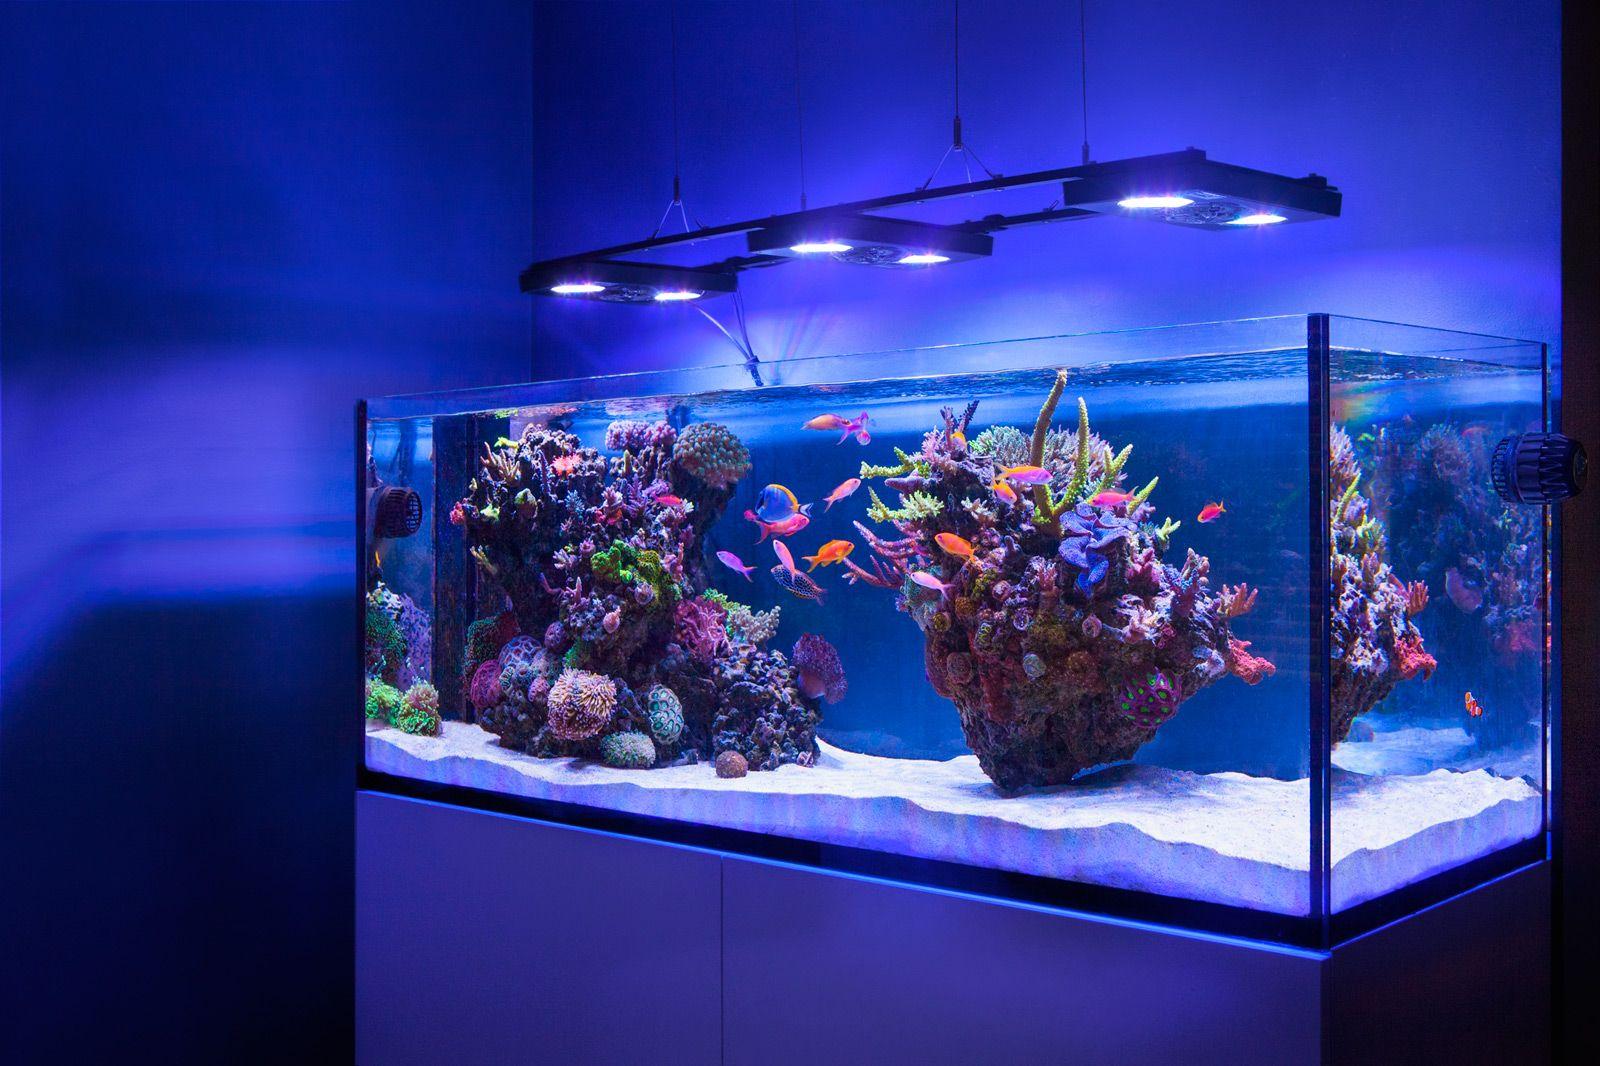 предполагают, картинки с видами аквариумов всего